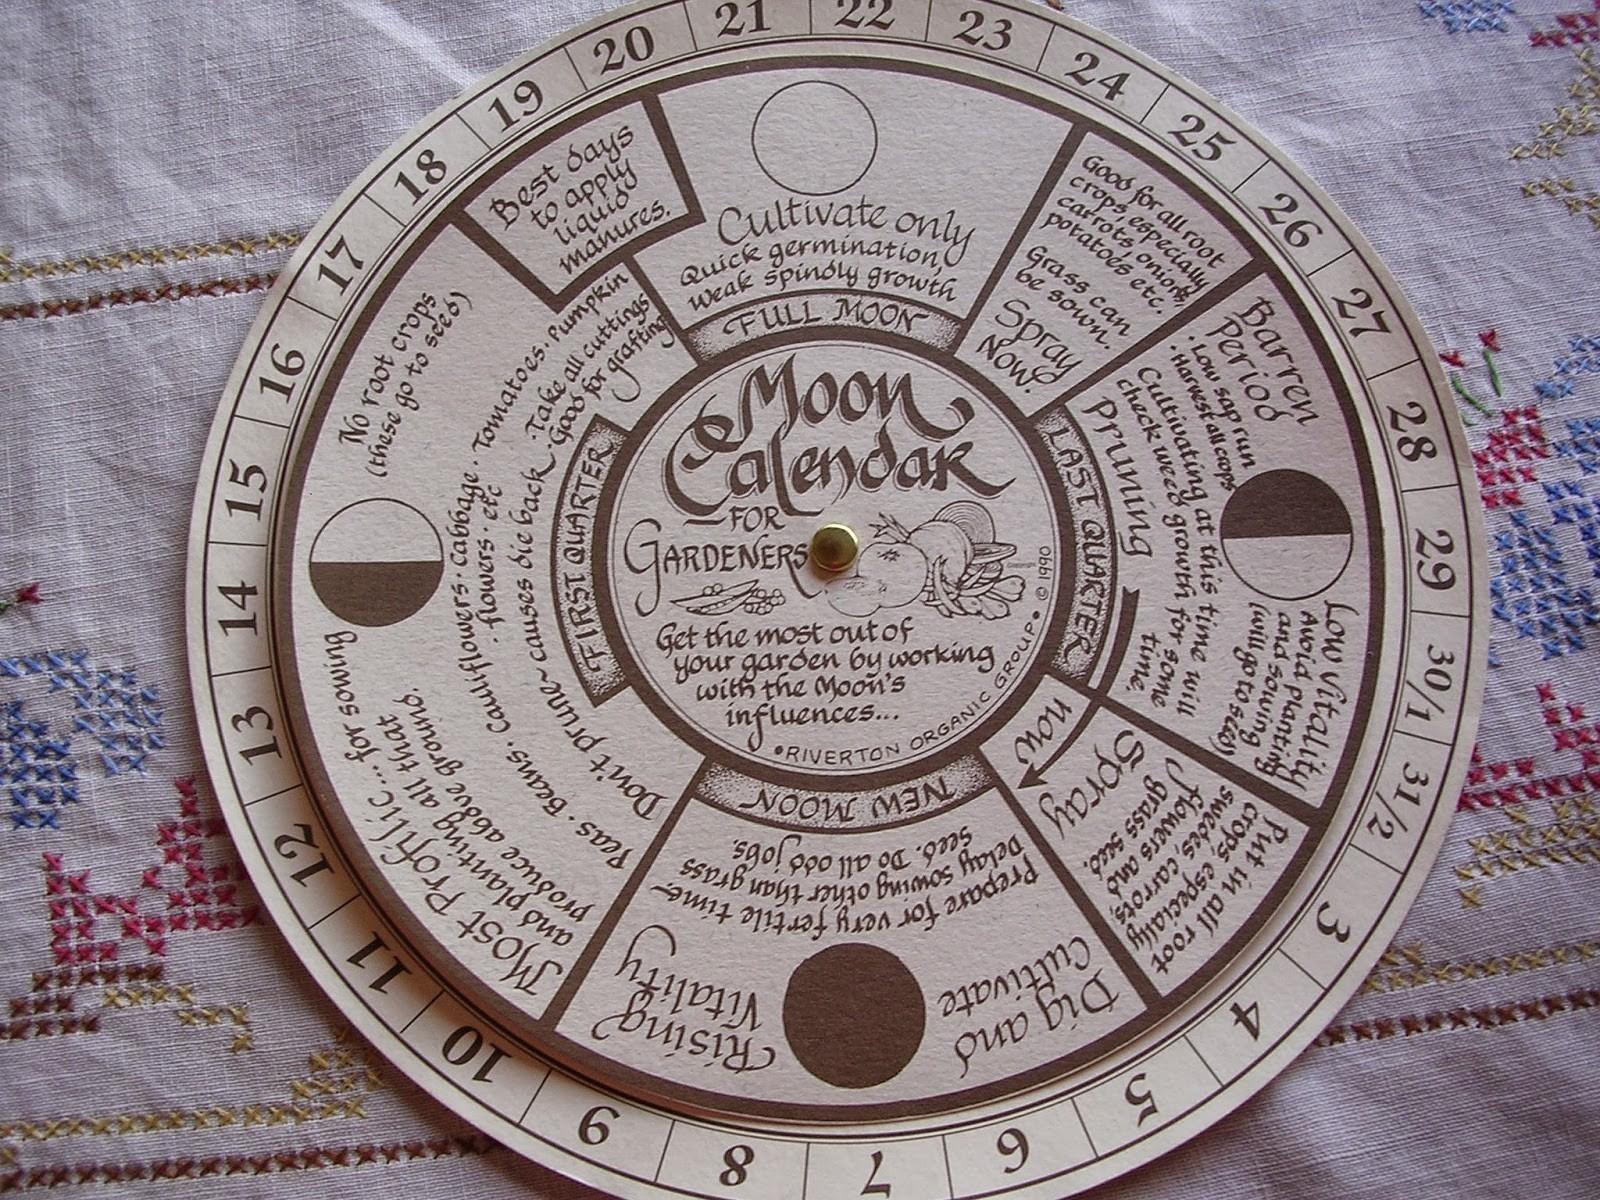 Moon Calendar -  Lunar Garden Calendar